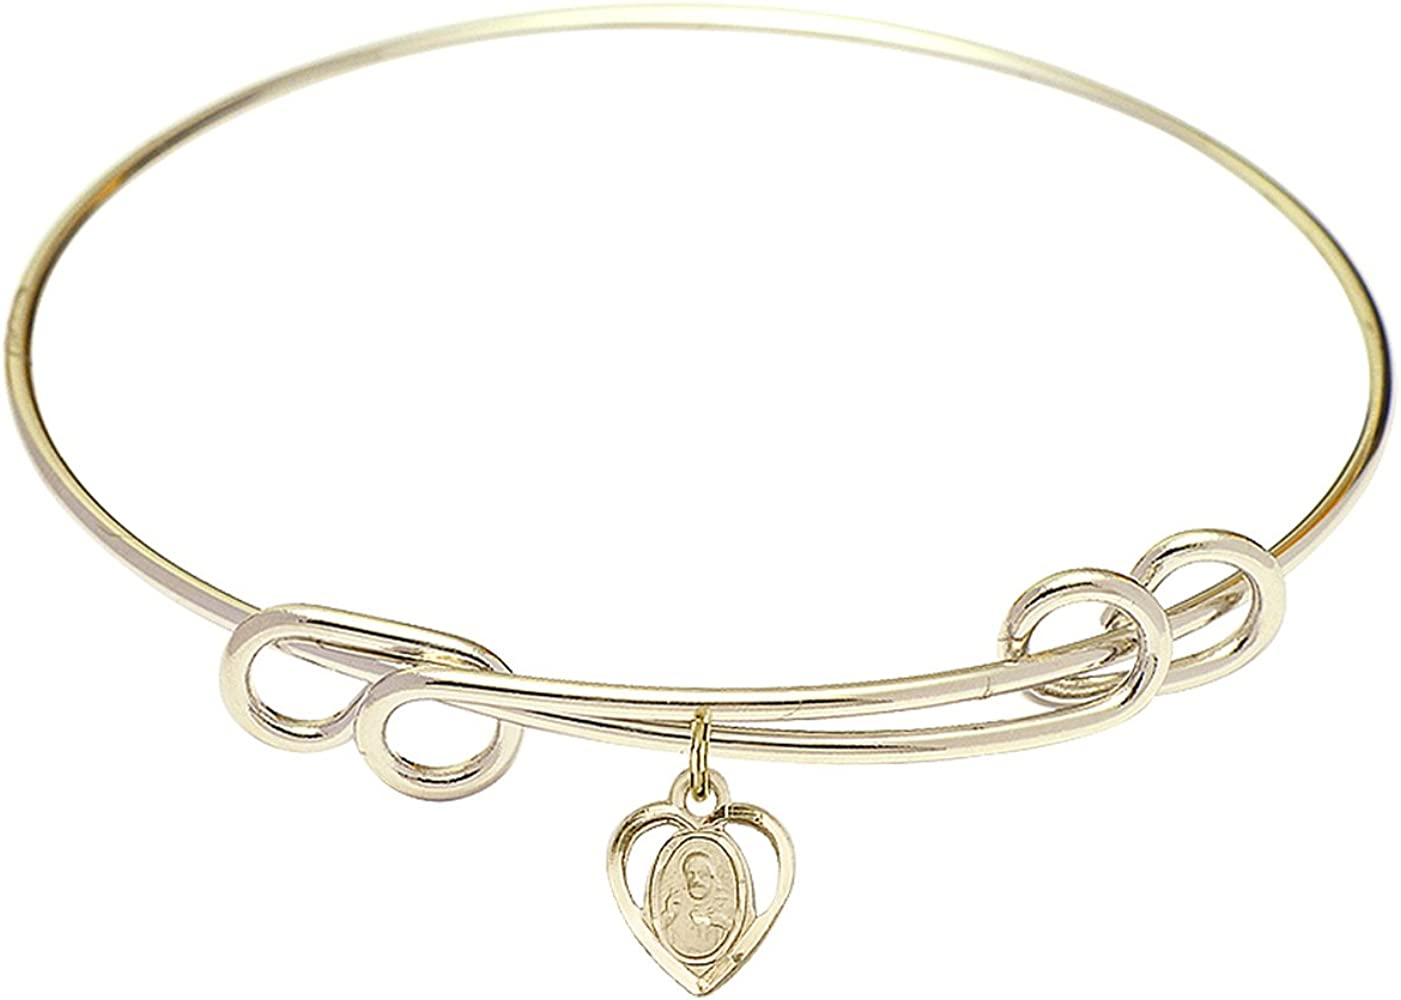 DiamondJewelryNY Double Loop Bangle Bracelet Scapular a Brand Cheap Sale Ranking TOP20 Venue Cha with